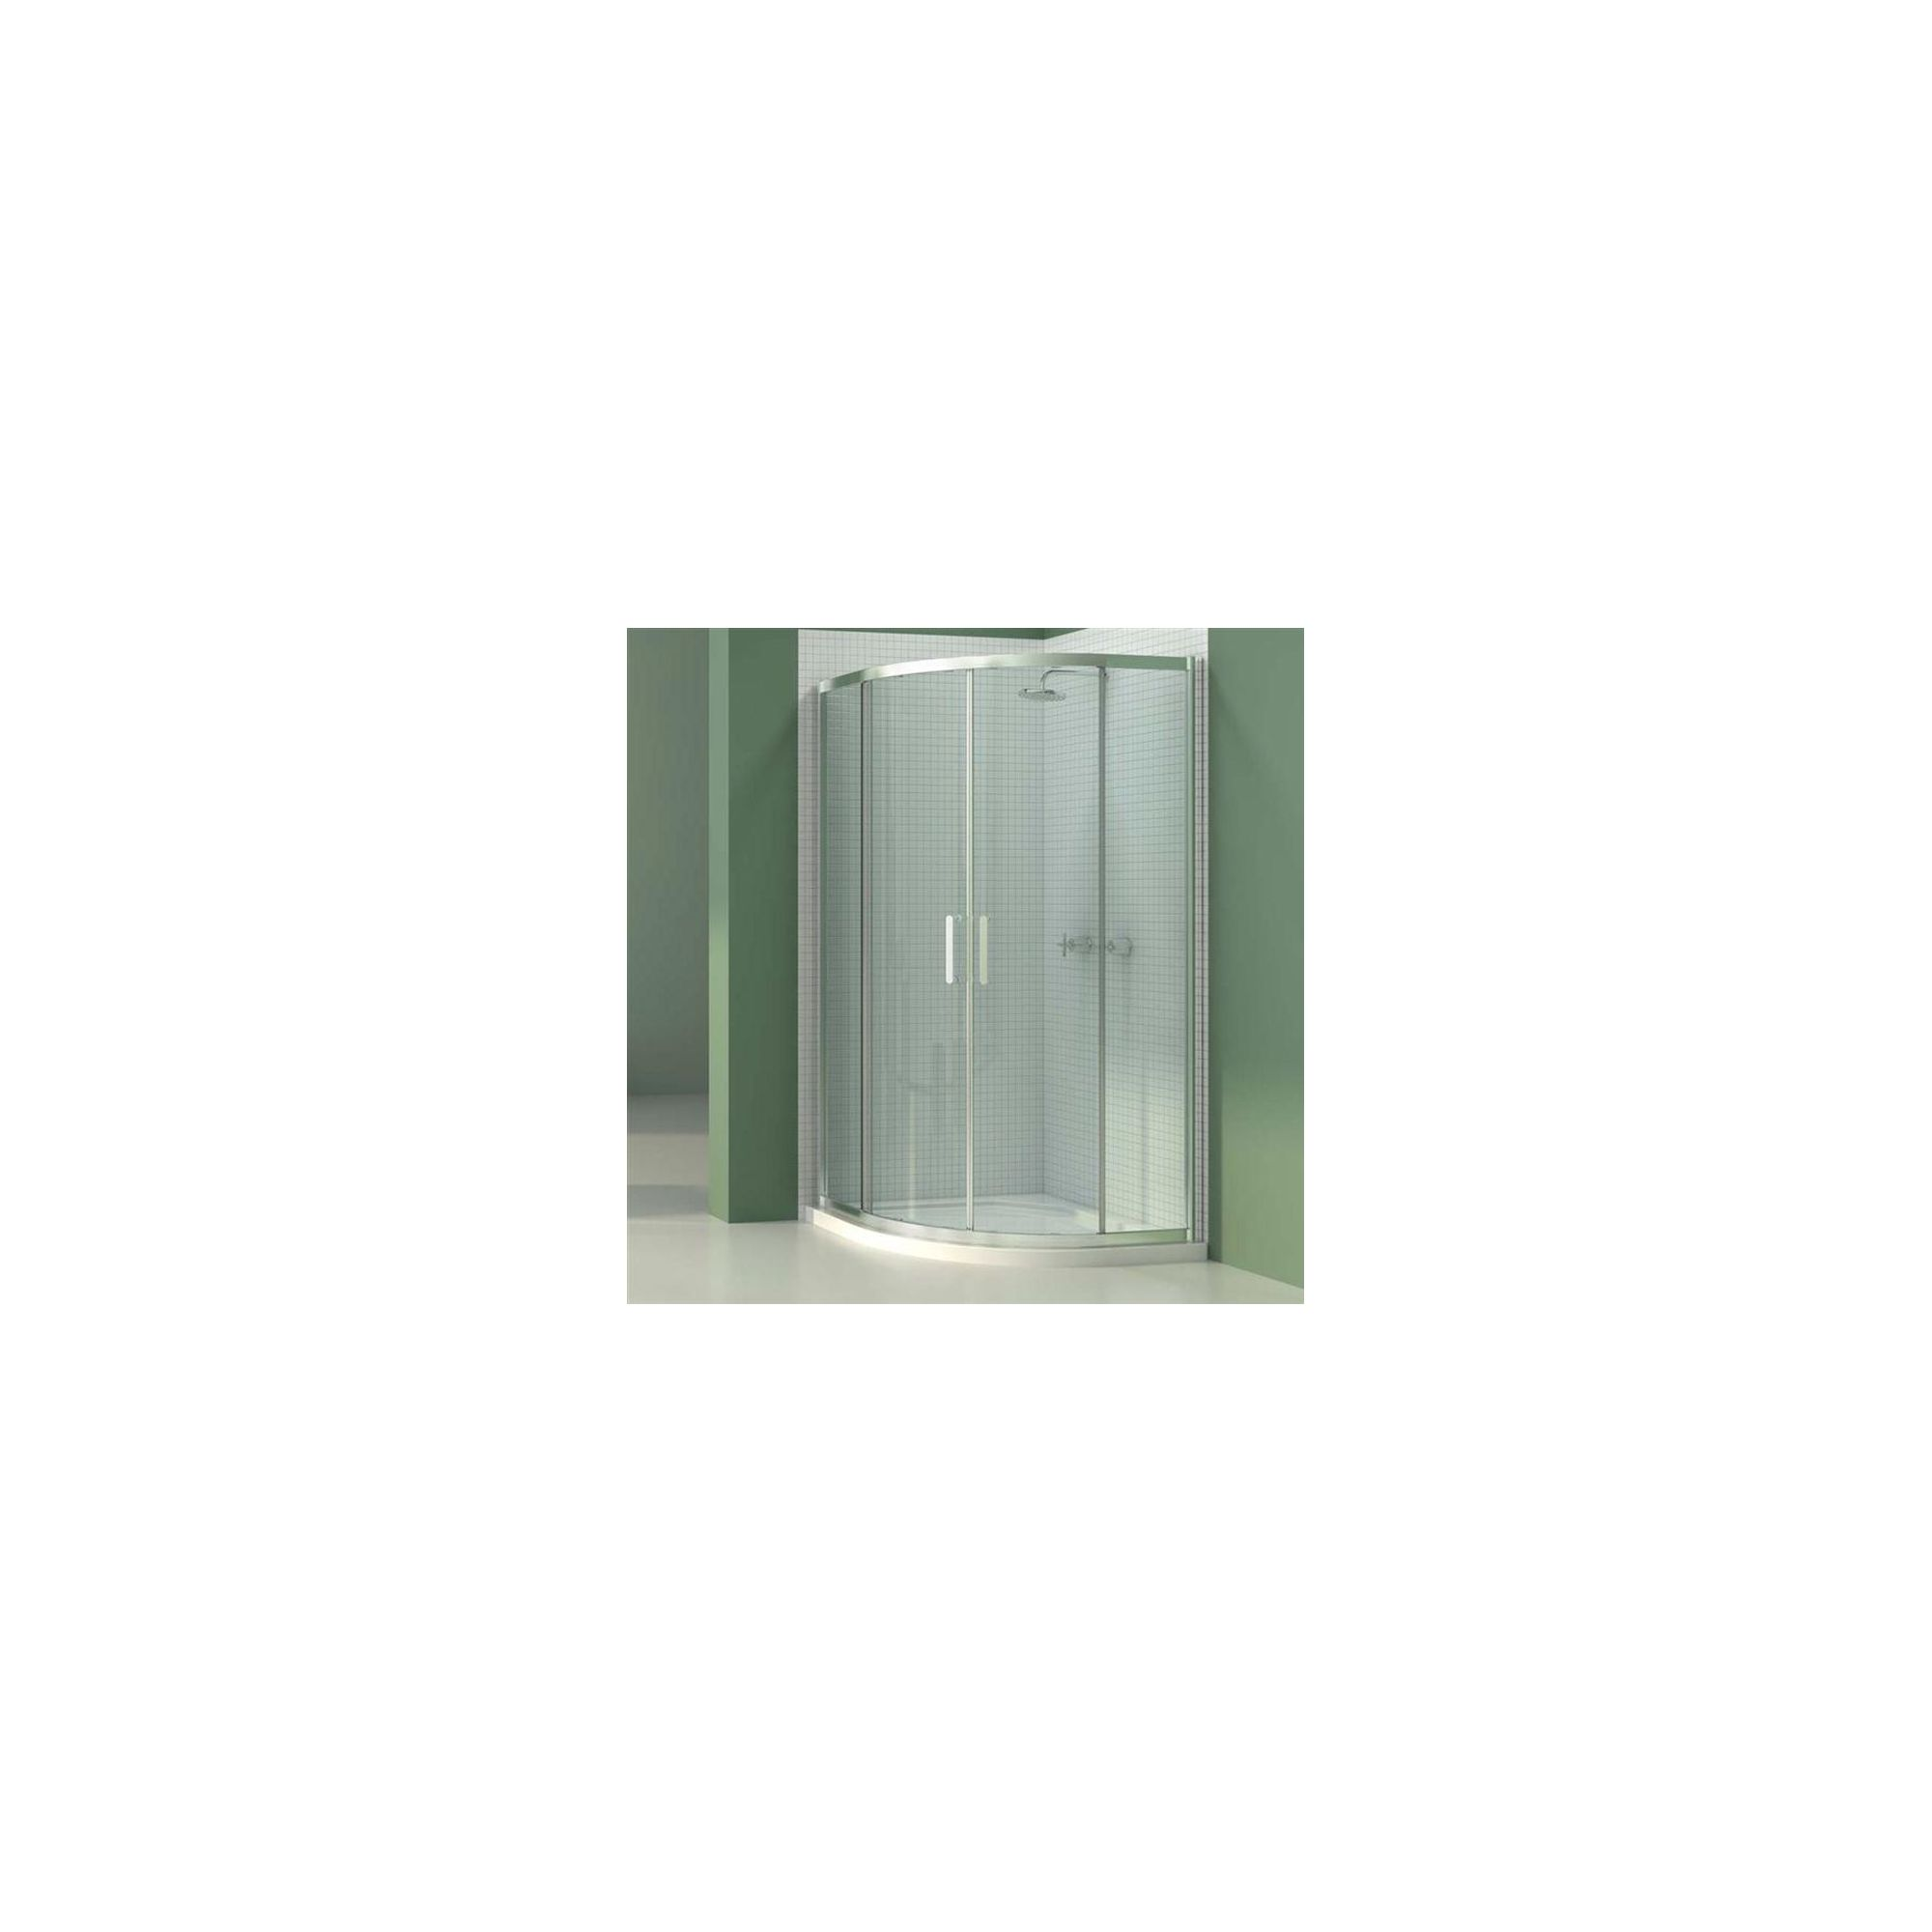 Merlyn Vivid Six Quadrant Shower Door, 900mm x 900mm, 6mm Glass at Tescos Direct